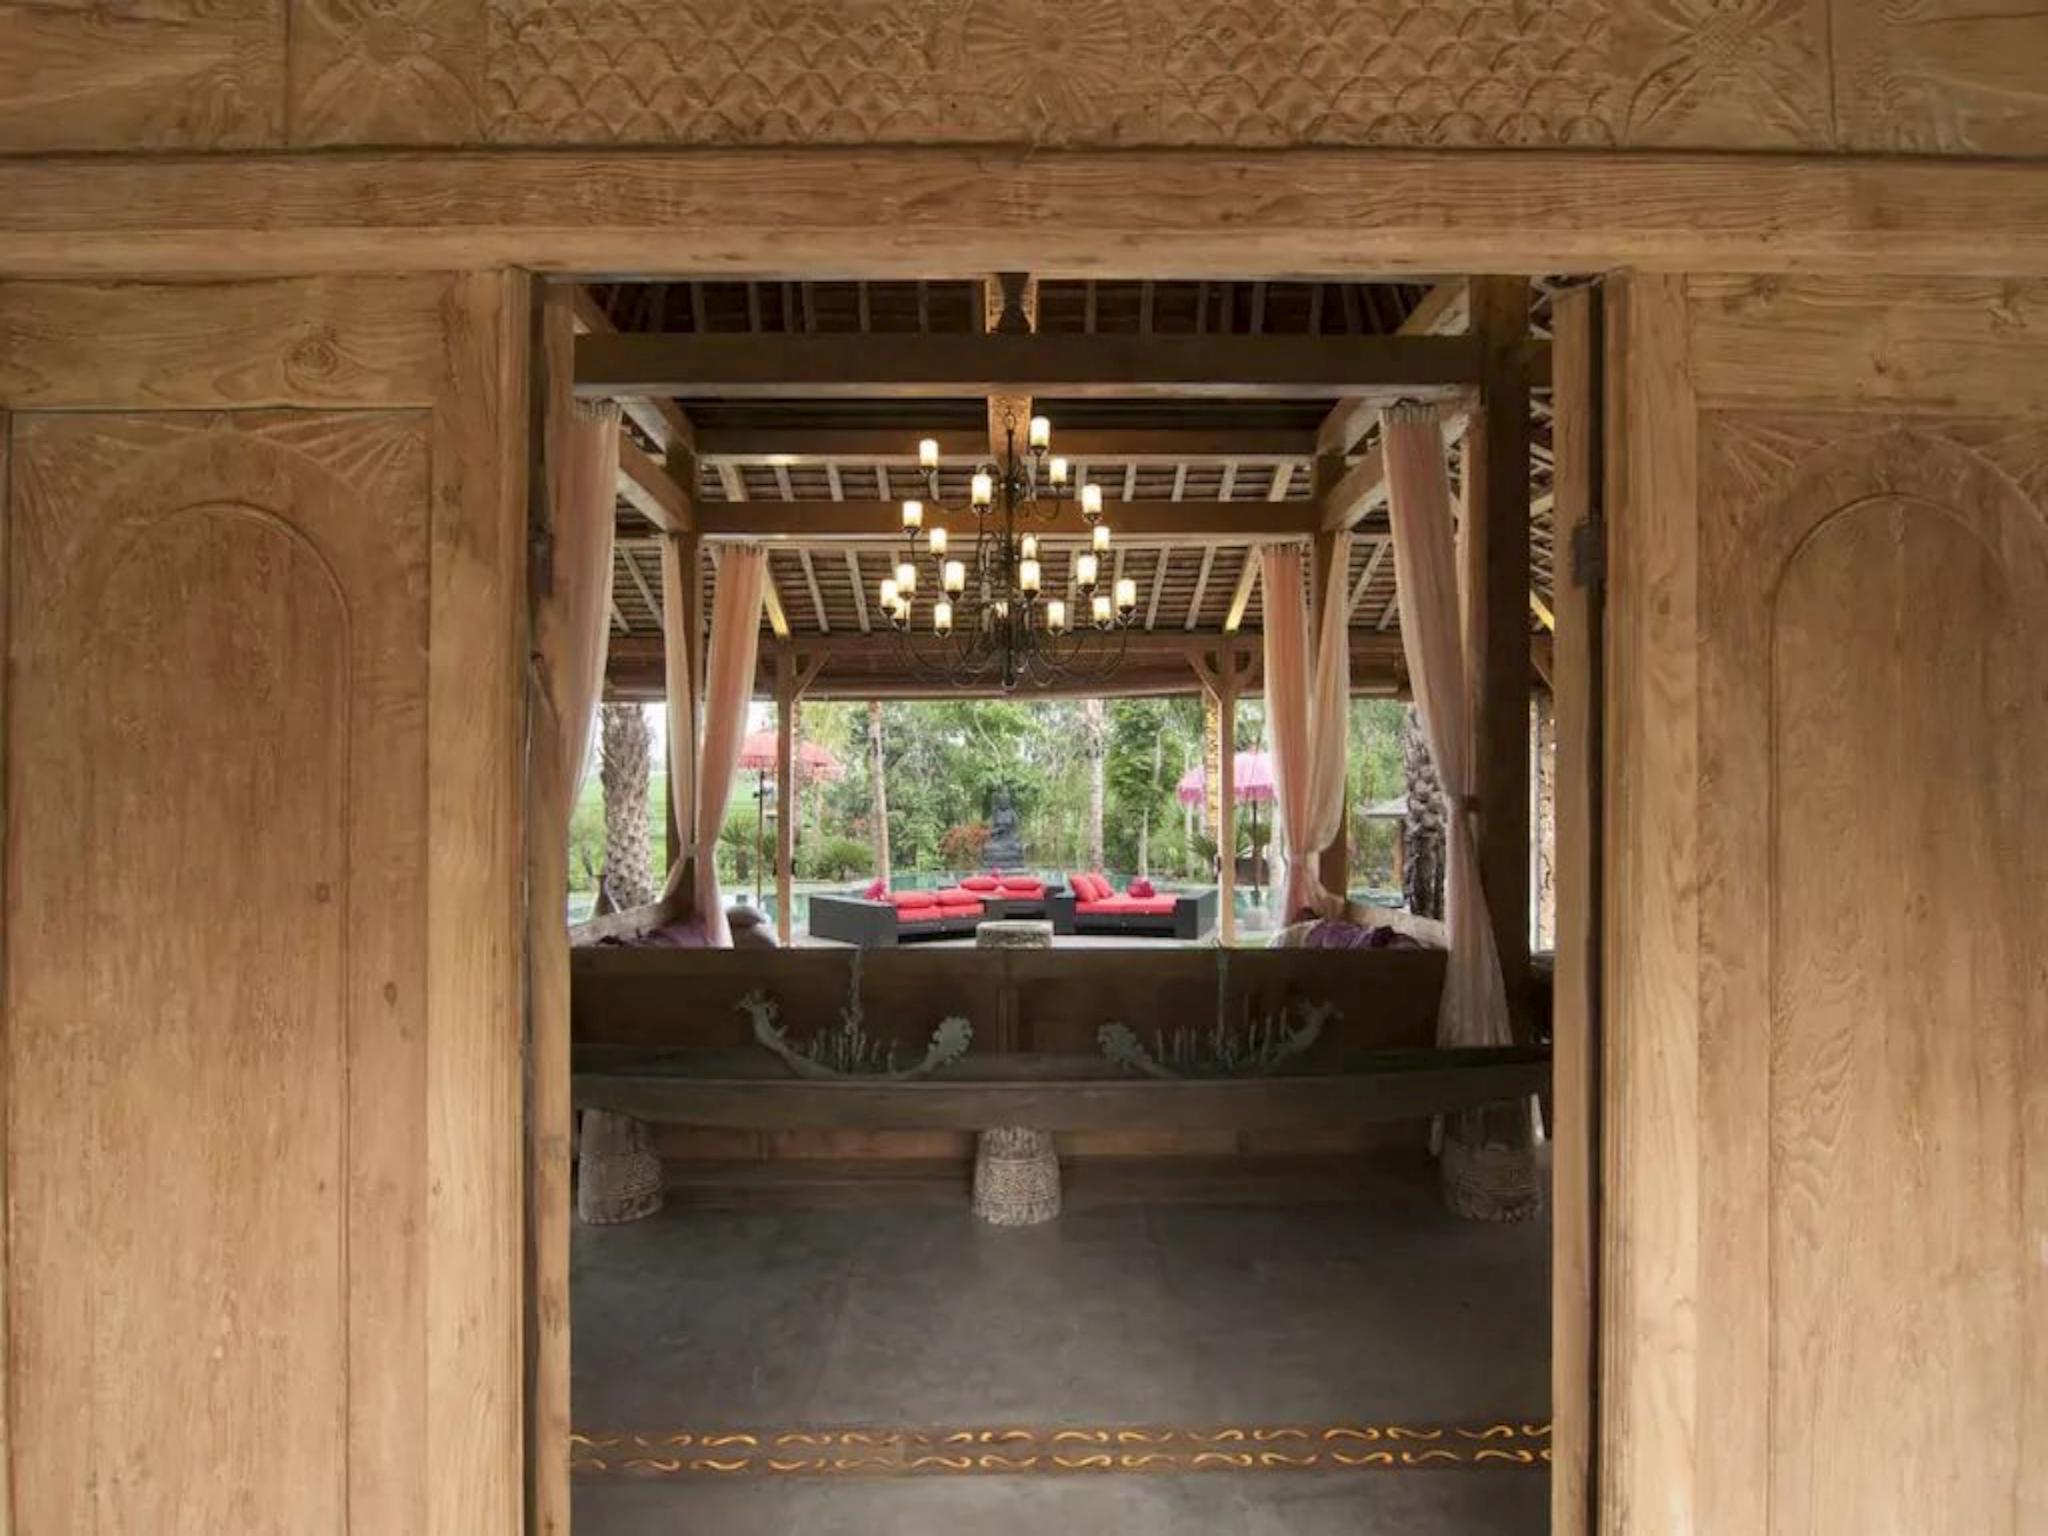 3 BDR Villa Javanese style in Umalas